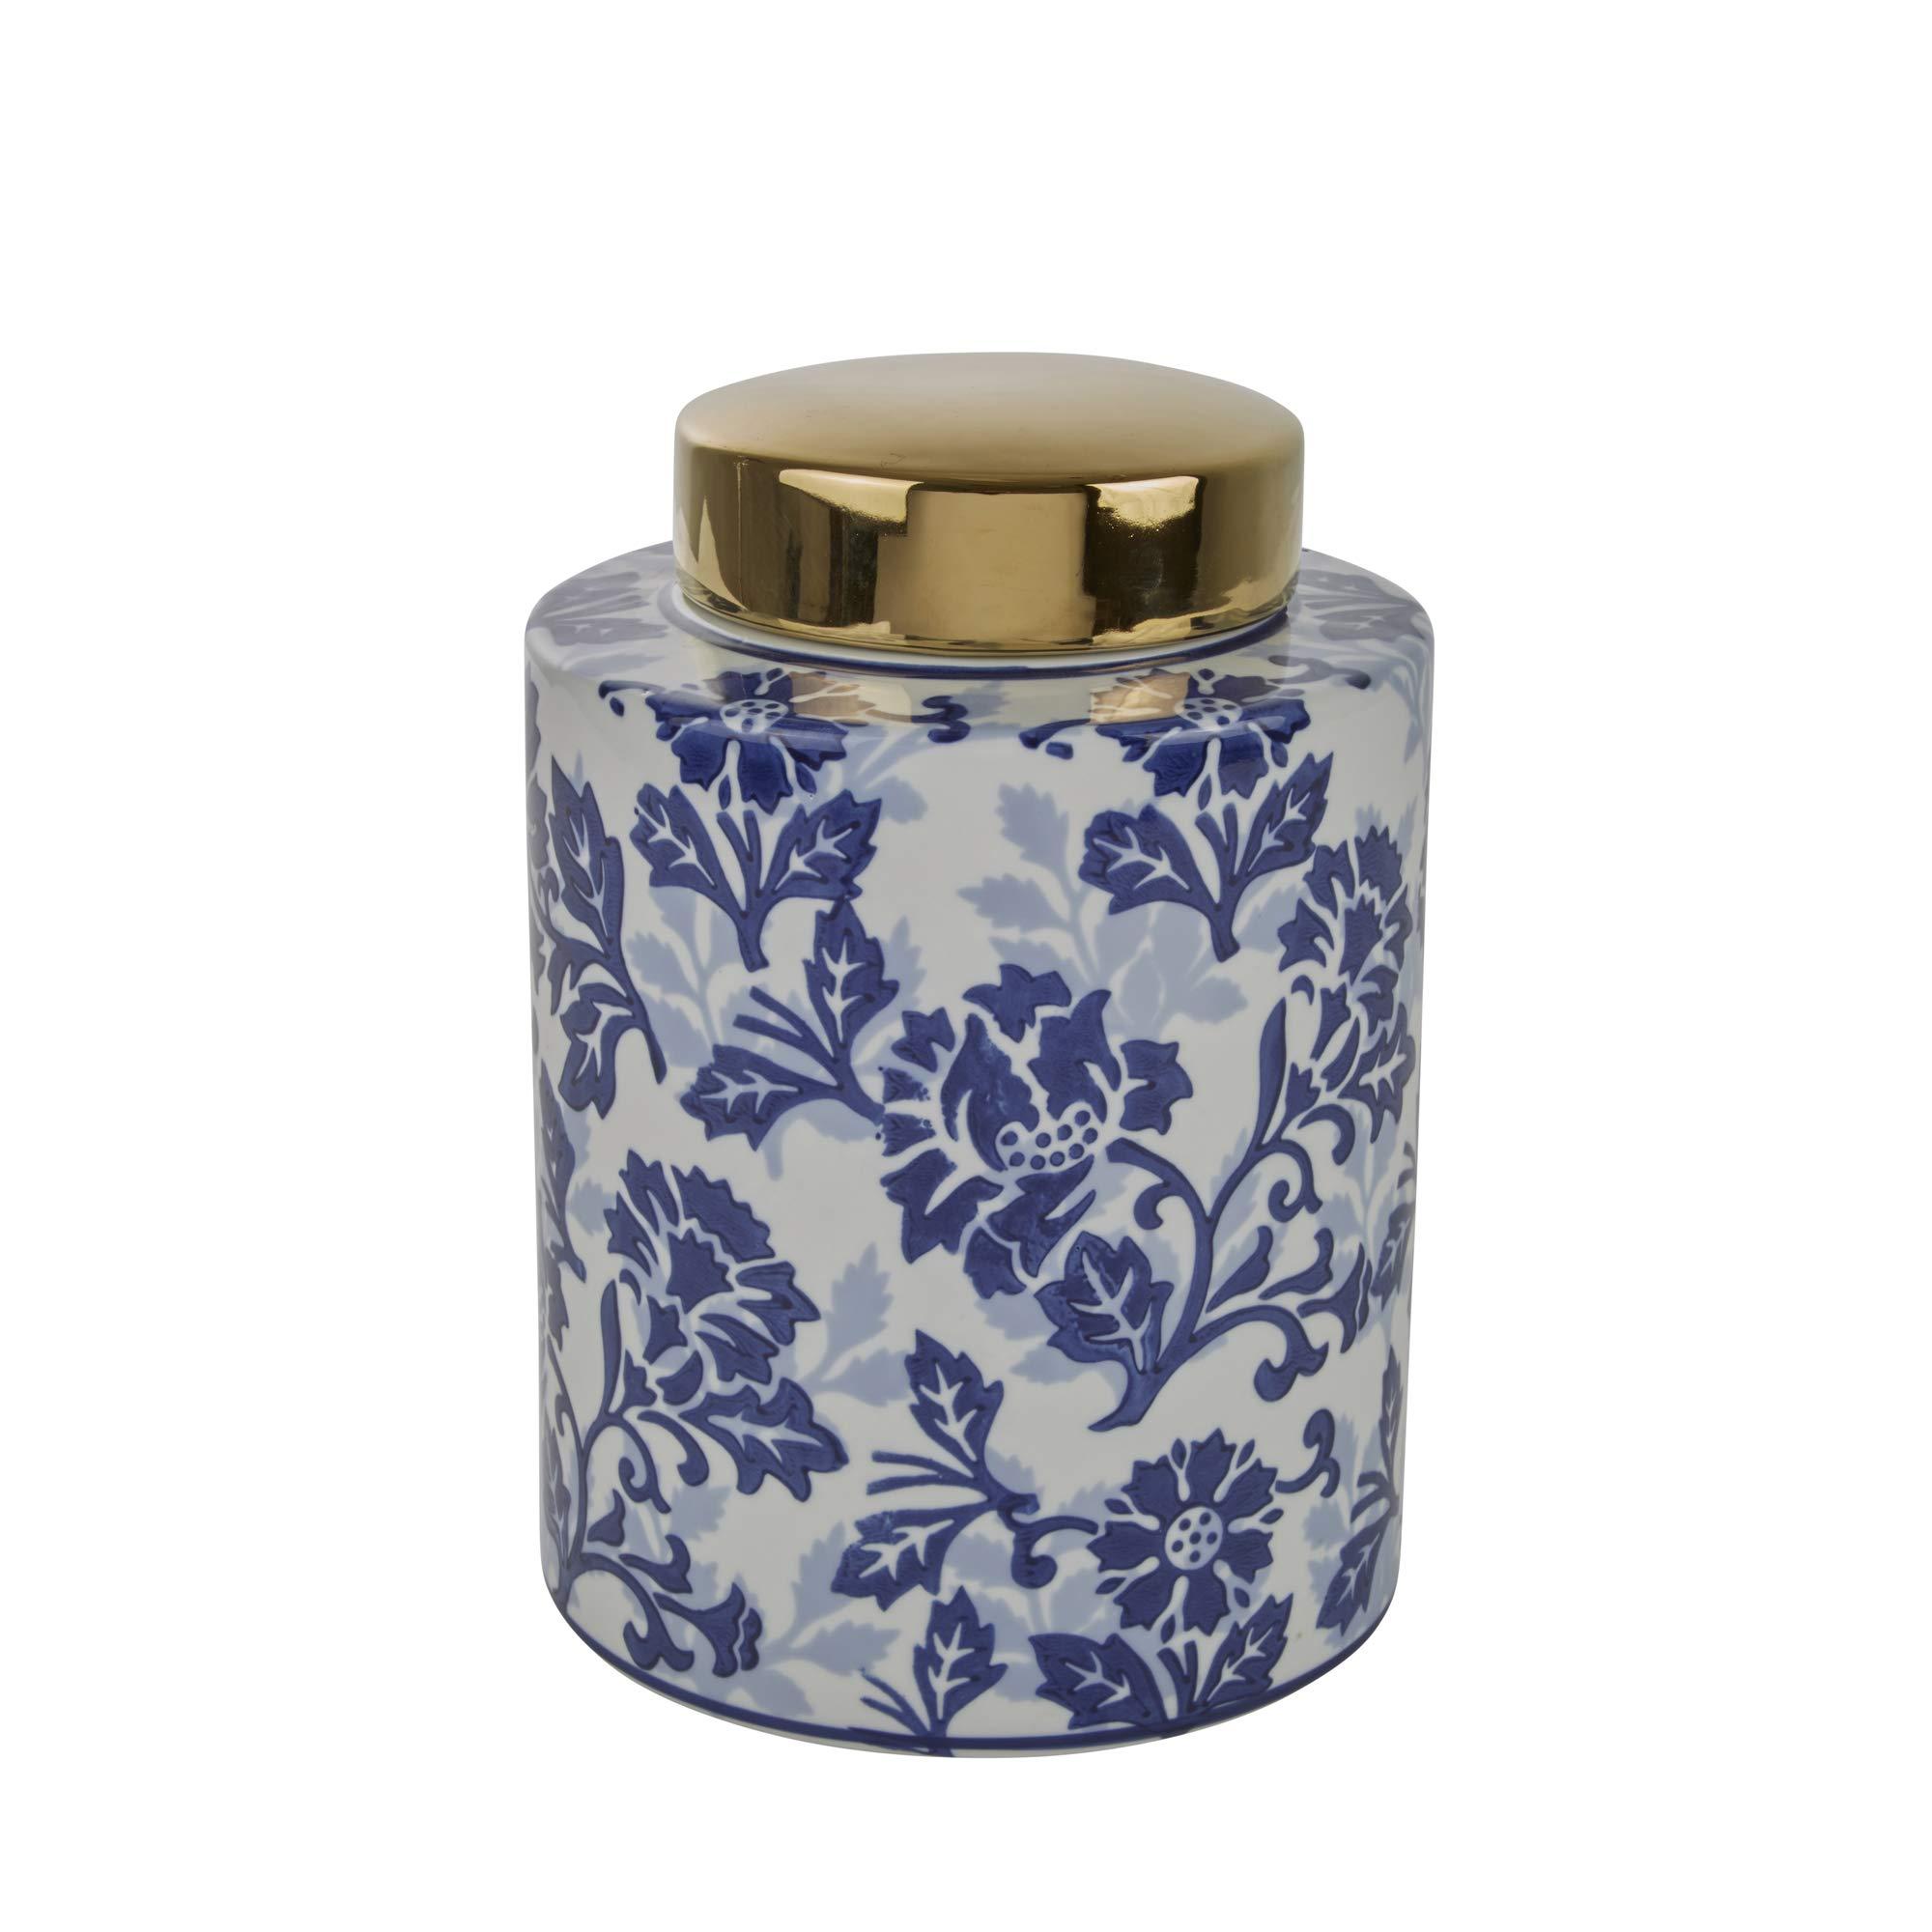 Sagebrook Home 13457-01 Ceramic Jar, 7.75'' x 7.75'' x 11'', Blue/White